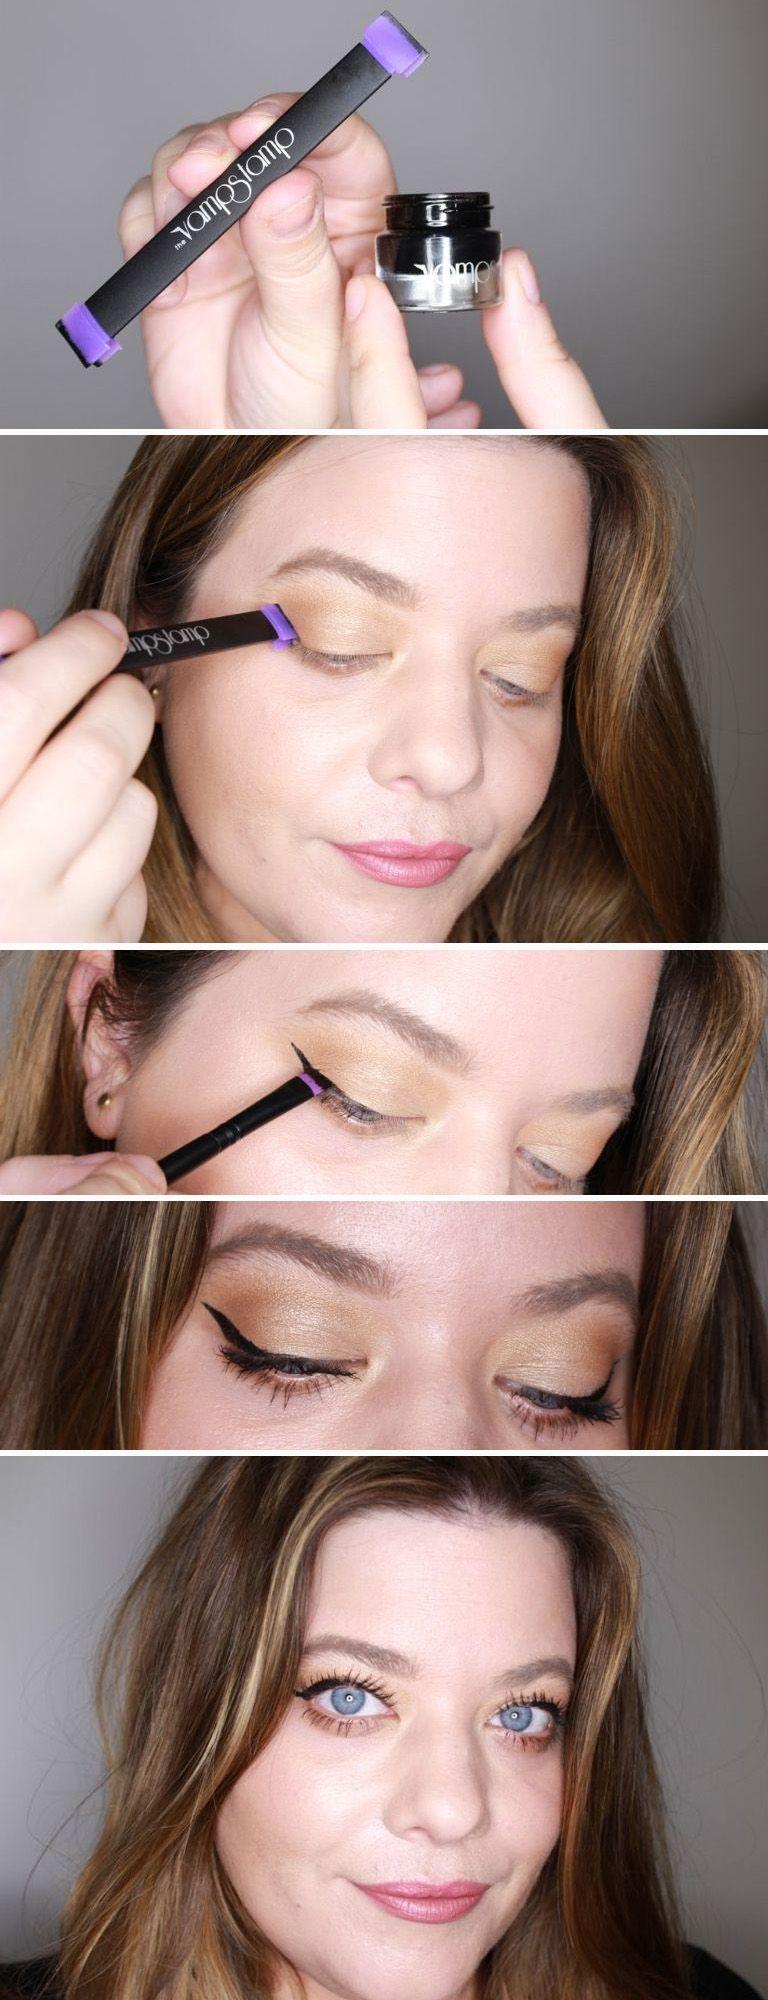 Eyeliner Strong-Willed Eyeliner Double Head Durable Waterproof Black Wing Seal Eyeliner Eye Makeup Beauty Pencil Tool Maquillage Skilful Manufacture